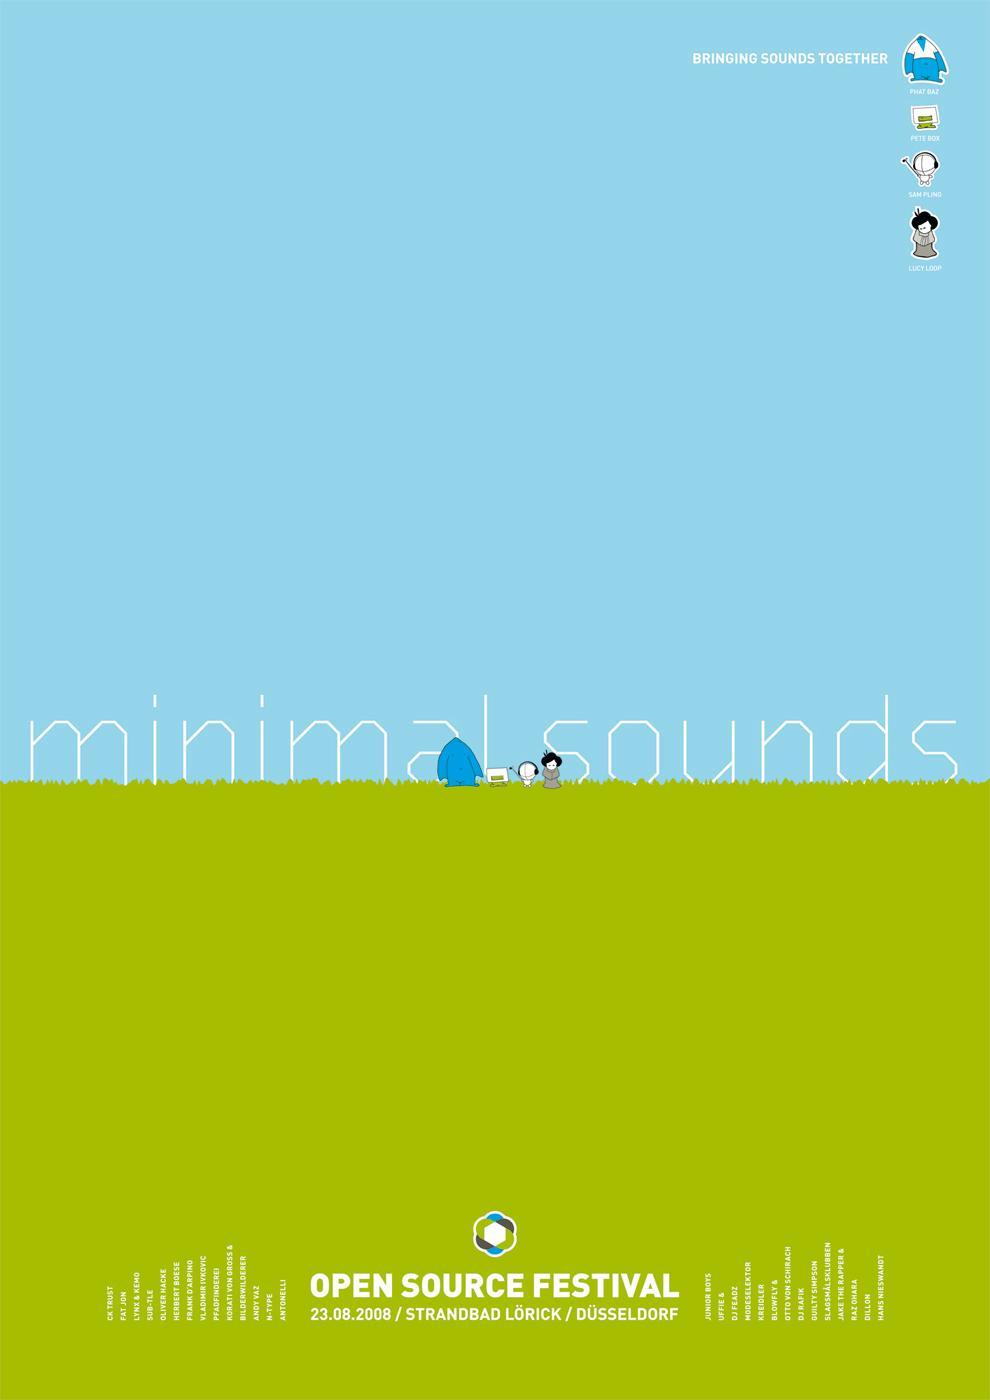 Open Source Festival Print Ad -  Minimal sounds